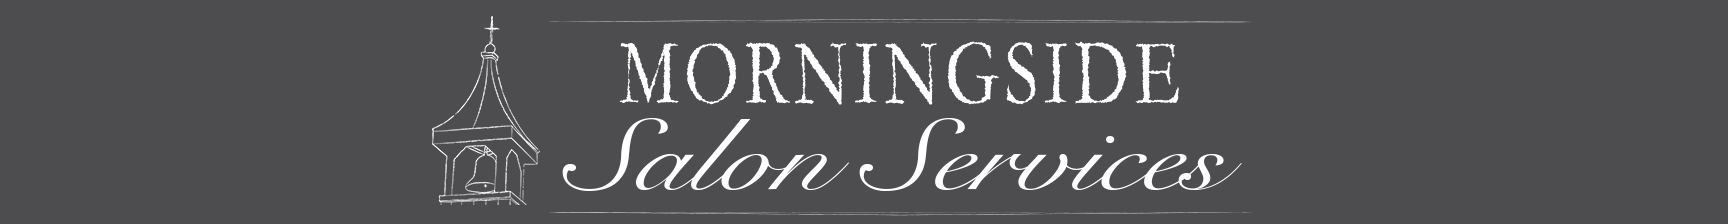 Morningside-Salon-Services